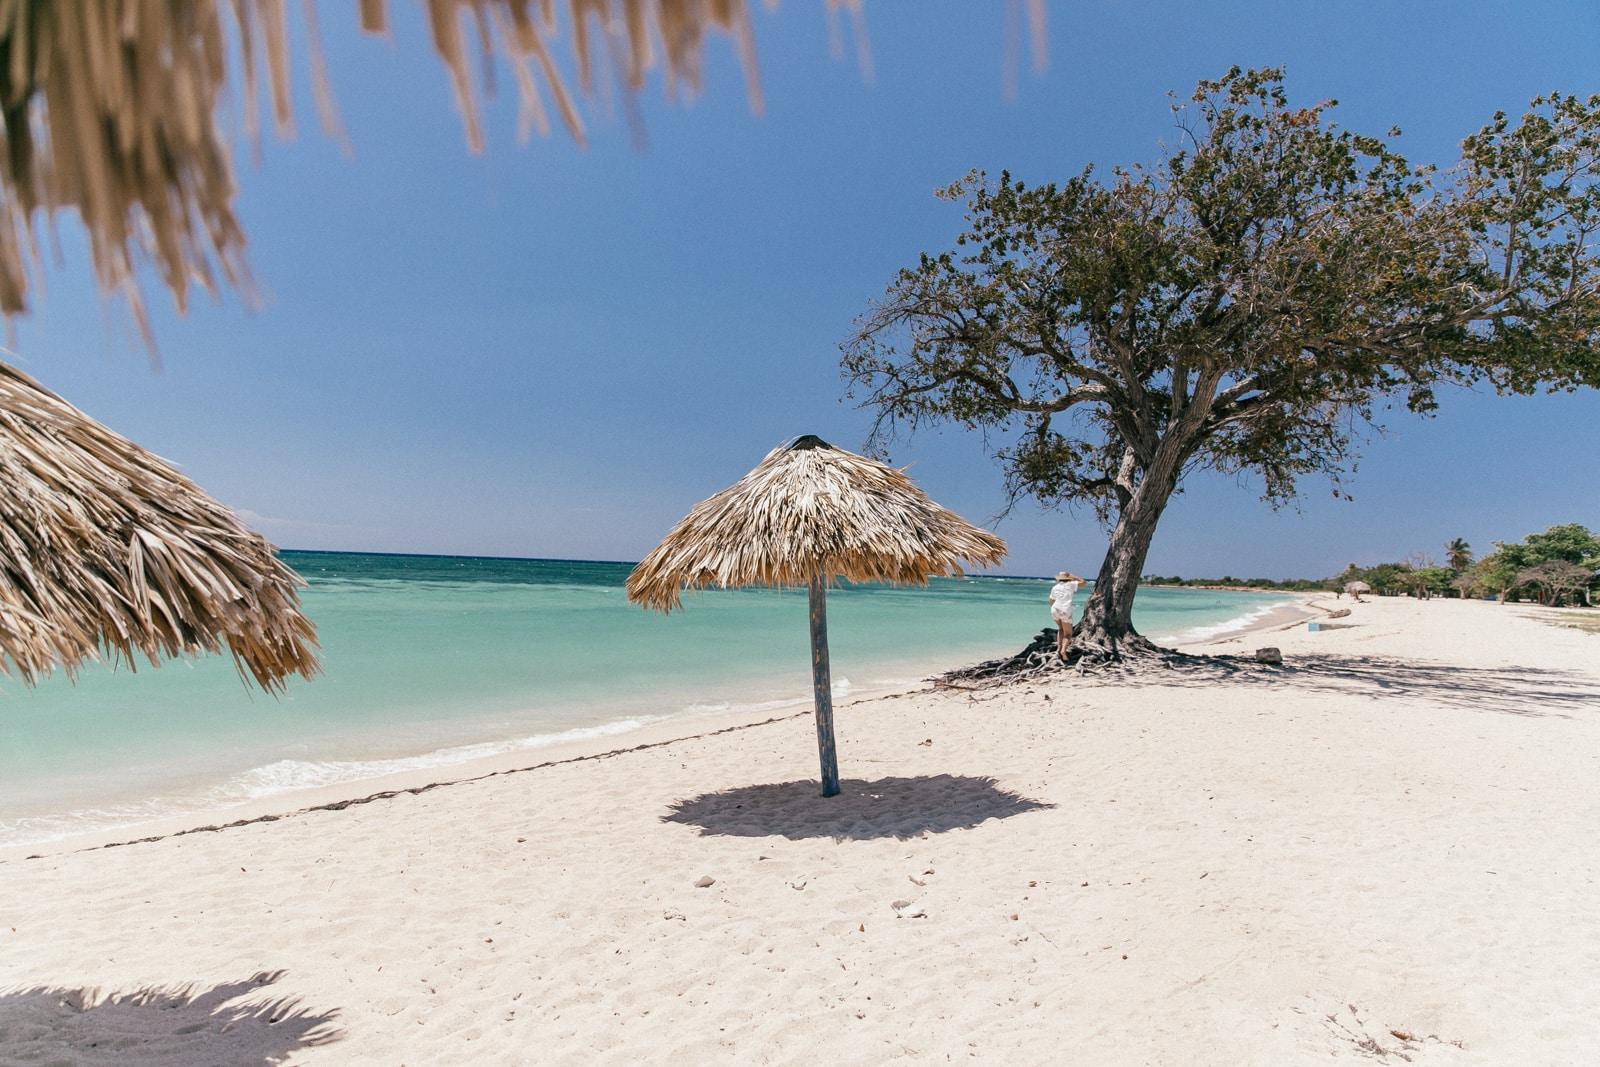 playa ancon cuba blog voyage